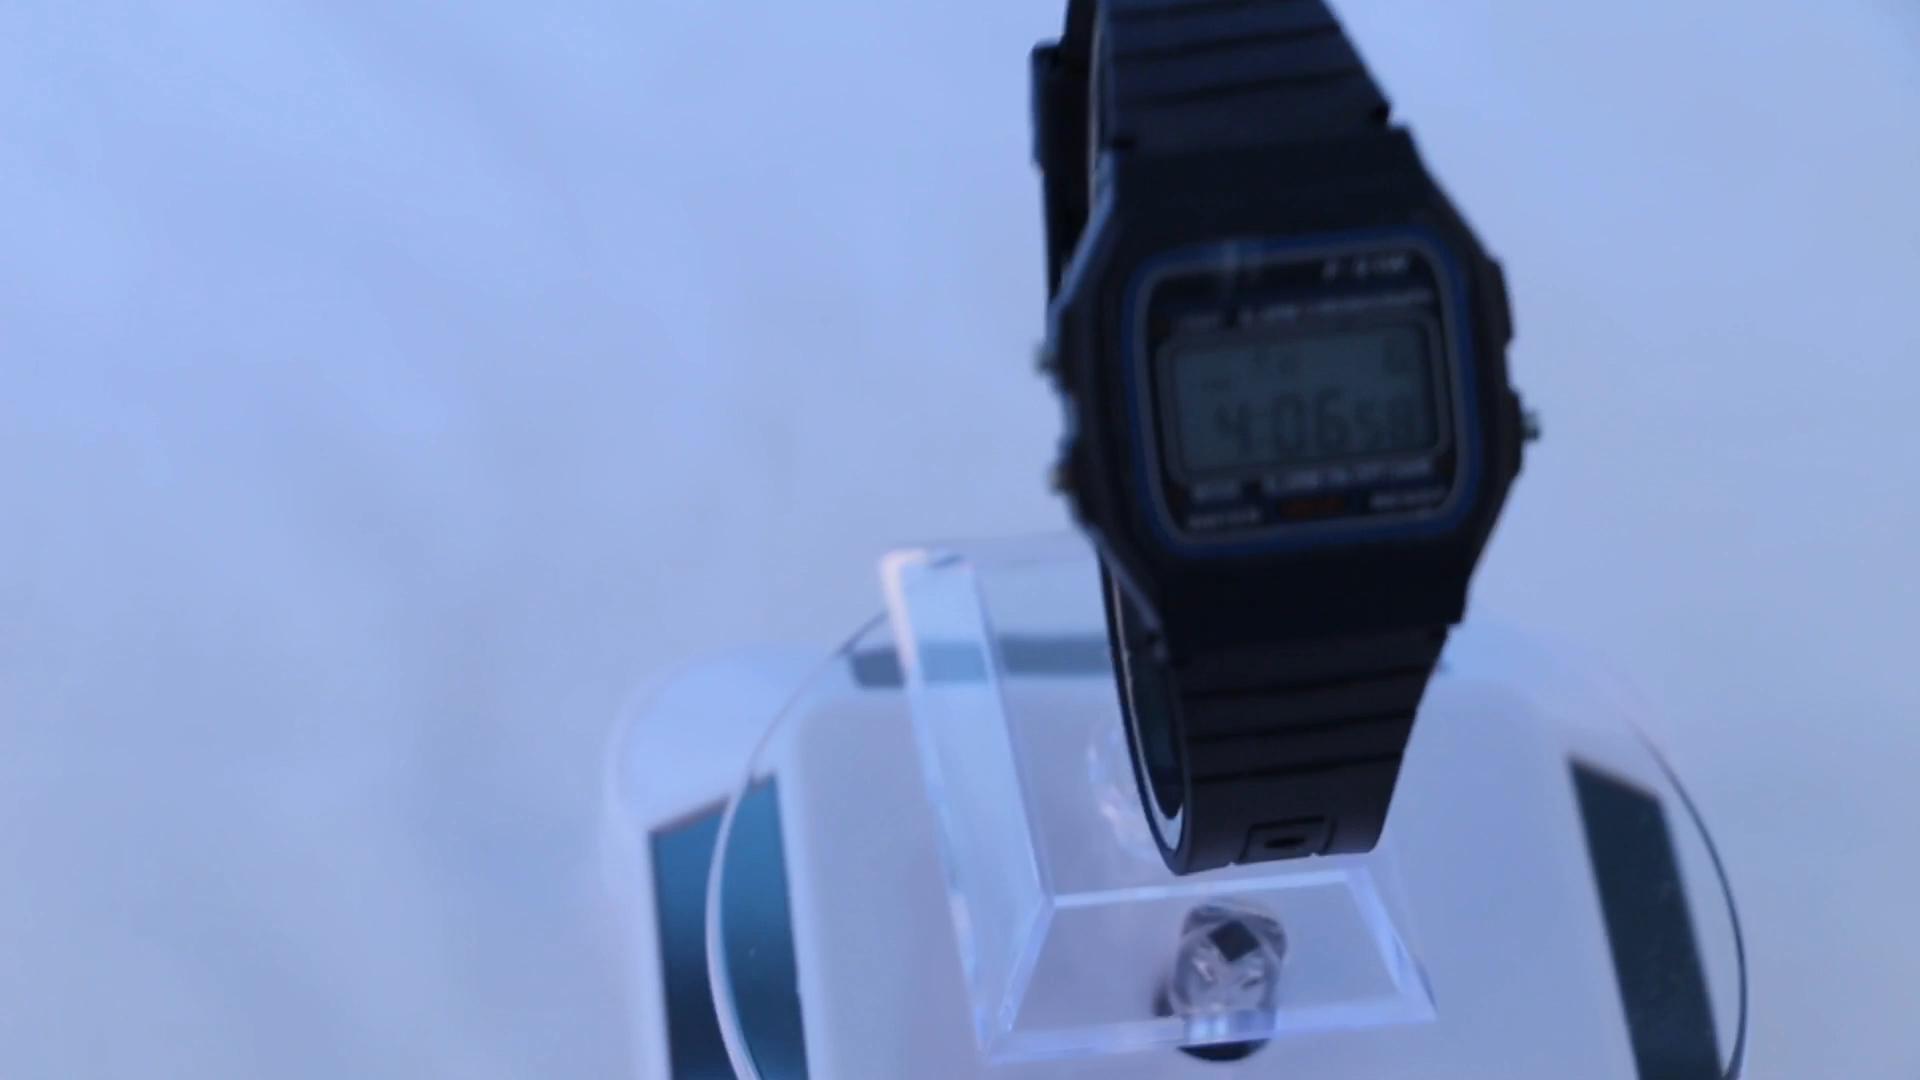 Relojes 子供はカジュアルクォーツスポーツ人気腕時計キッズデジタル腕時計